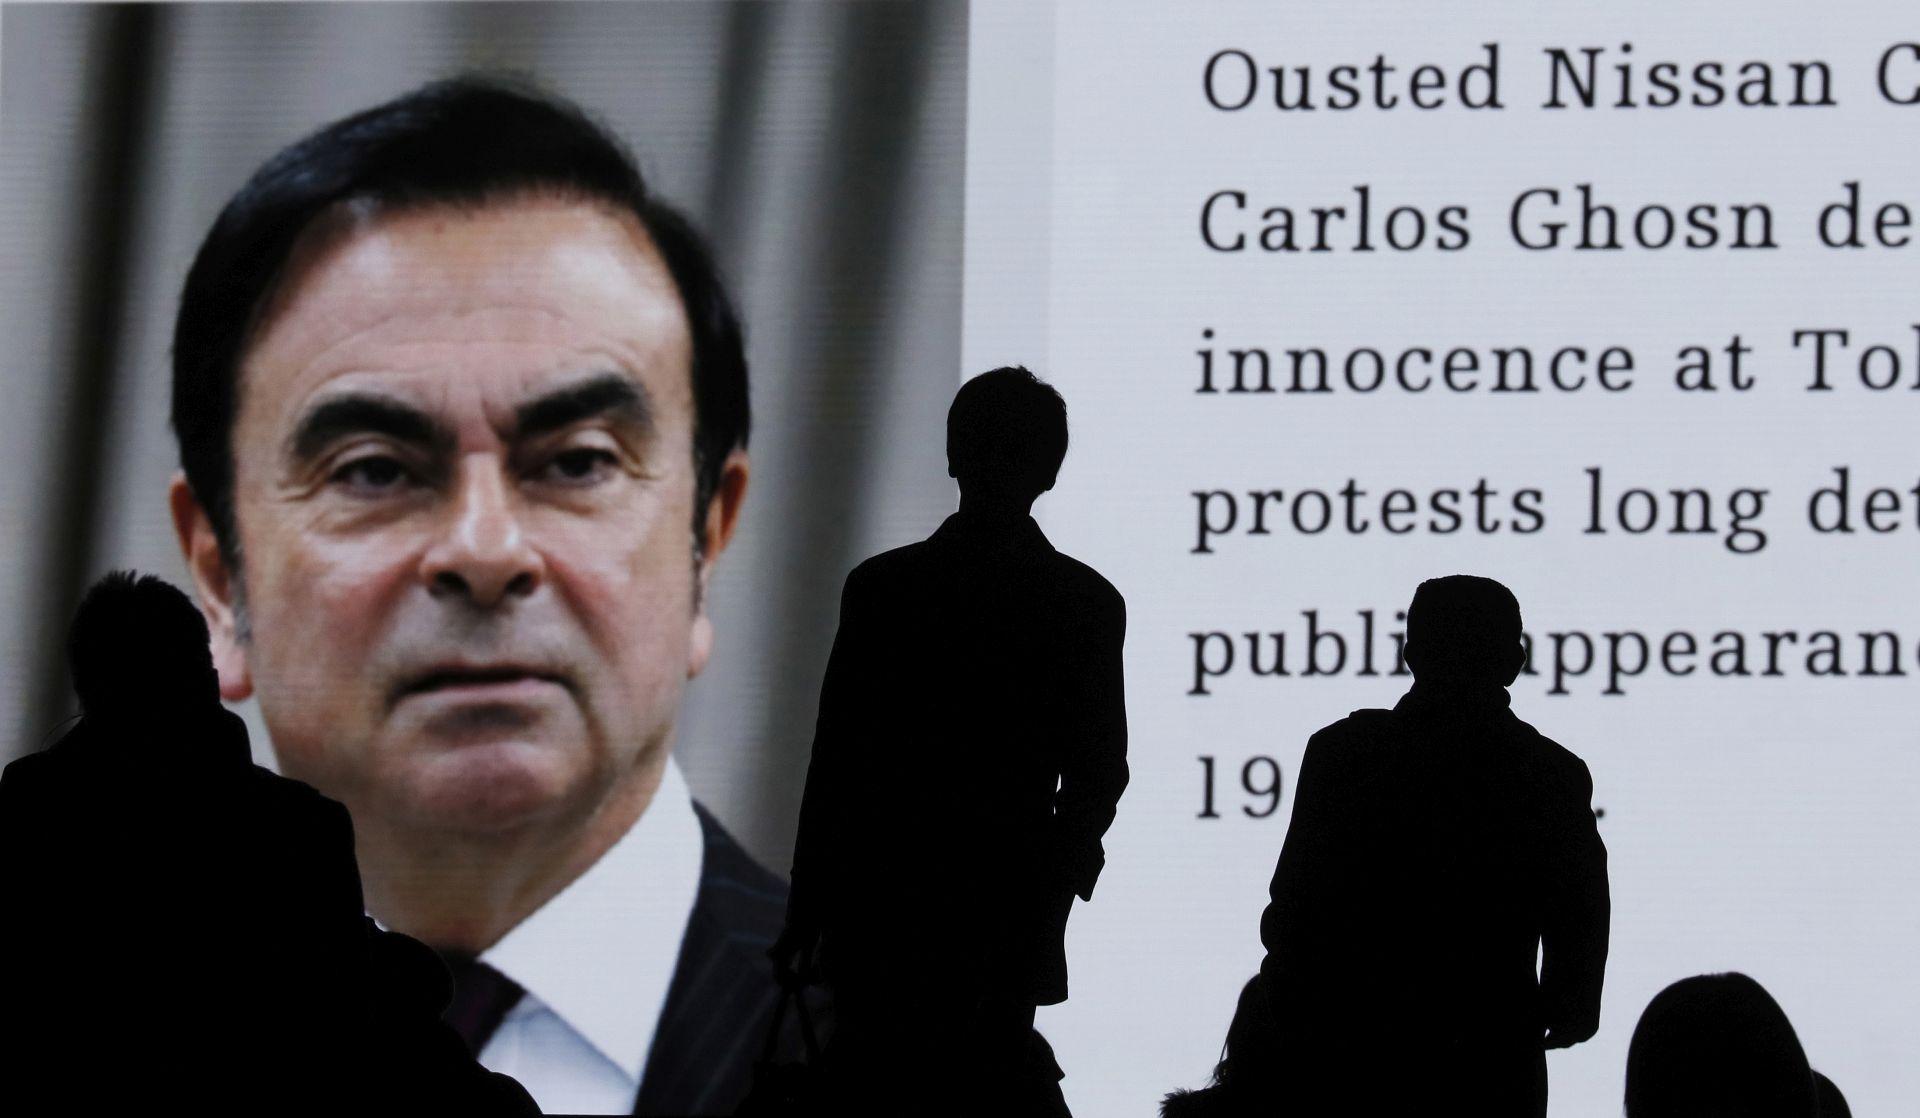 Šef Renaulta Carlos Ghosn podnio ostavku